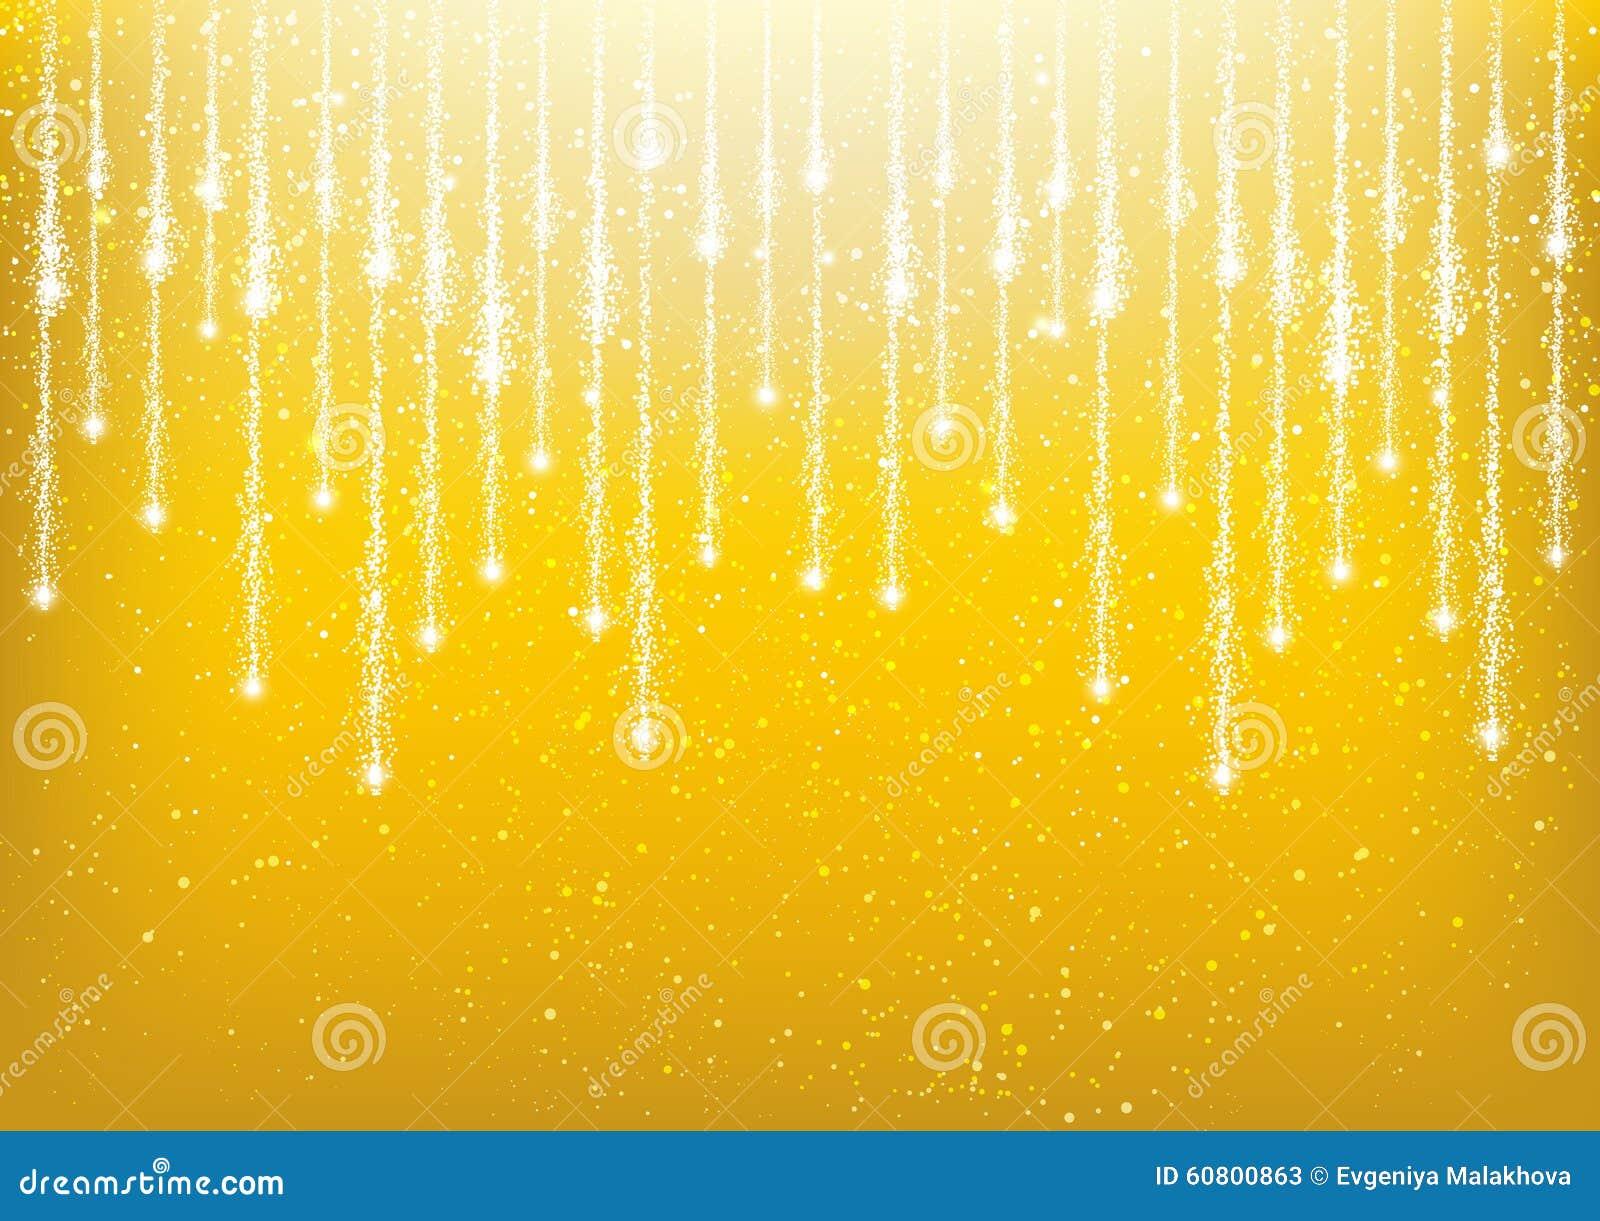 shiny golden lights stock - photo #25